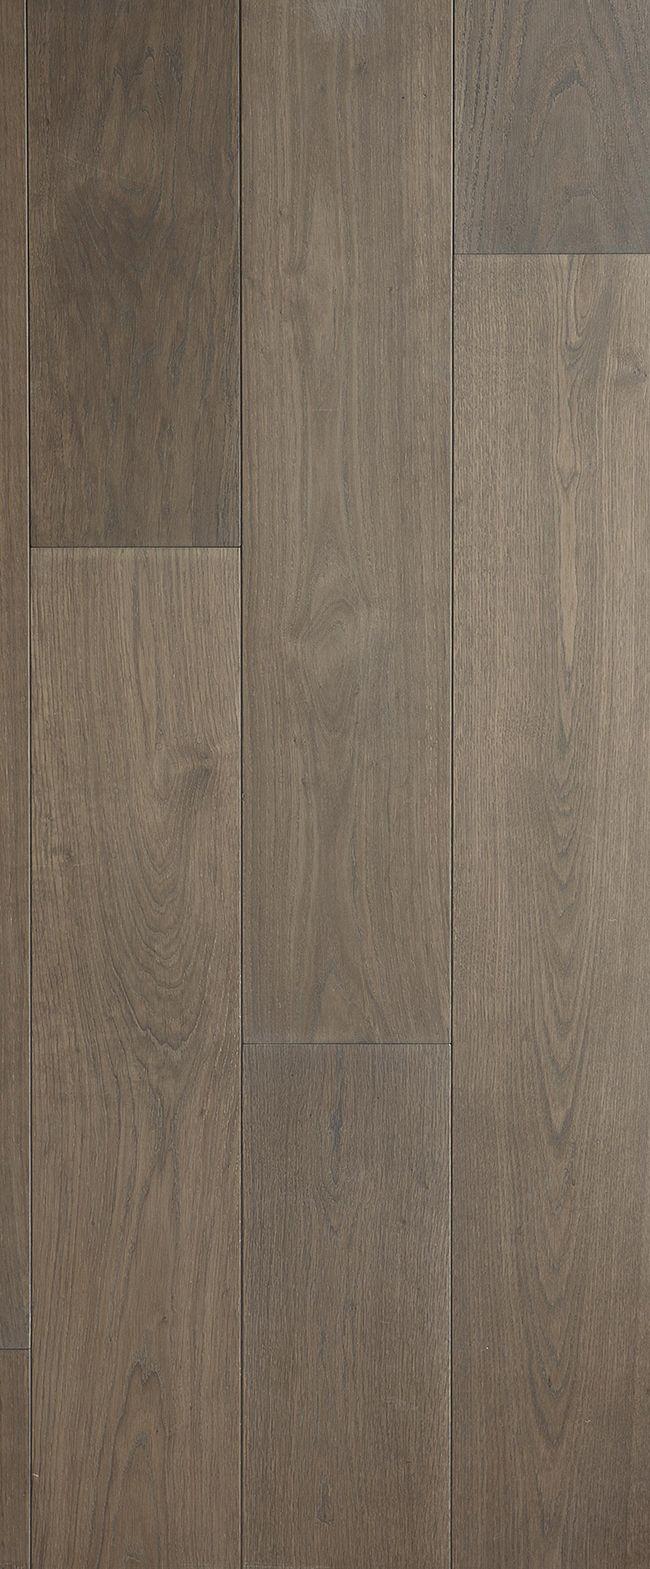 Driftwood Engineered Prime Oak Wood Floor Texture Wood Texture Ceiling Texture Types